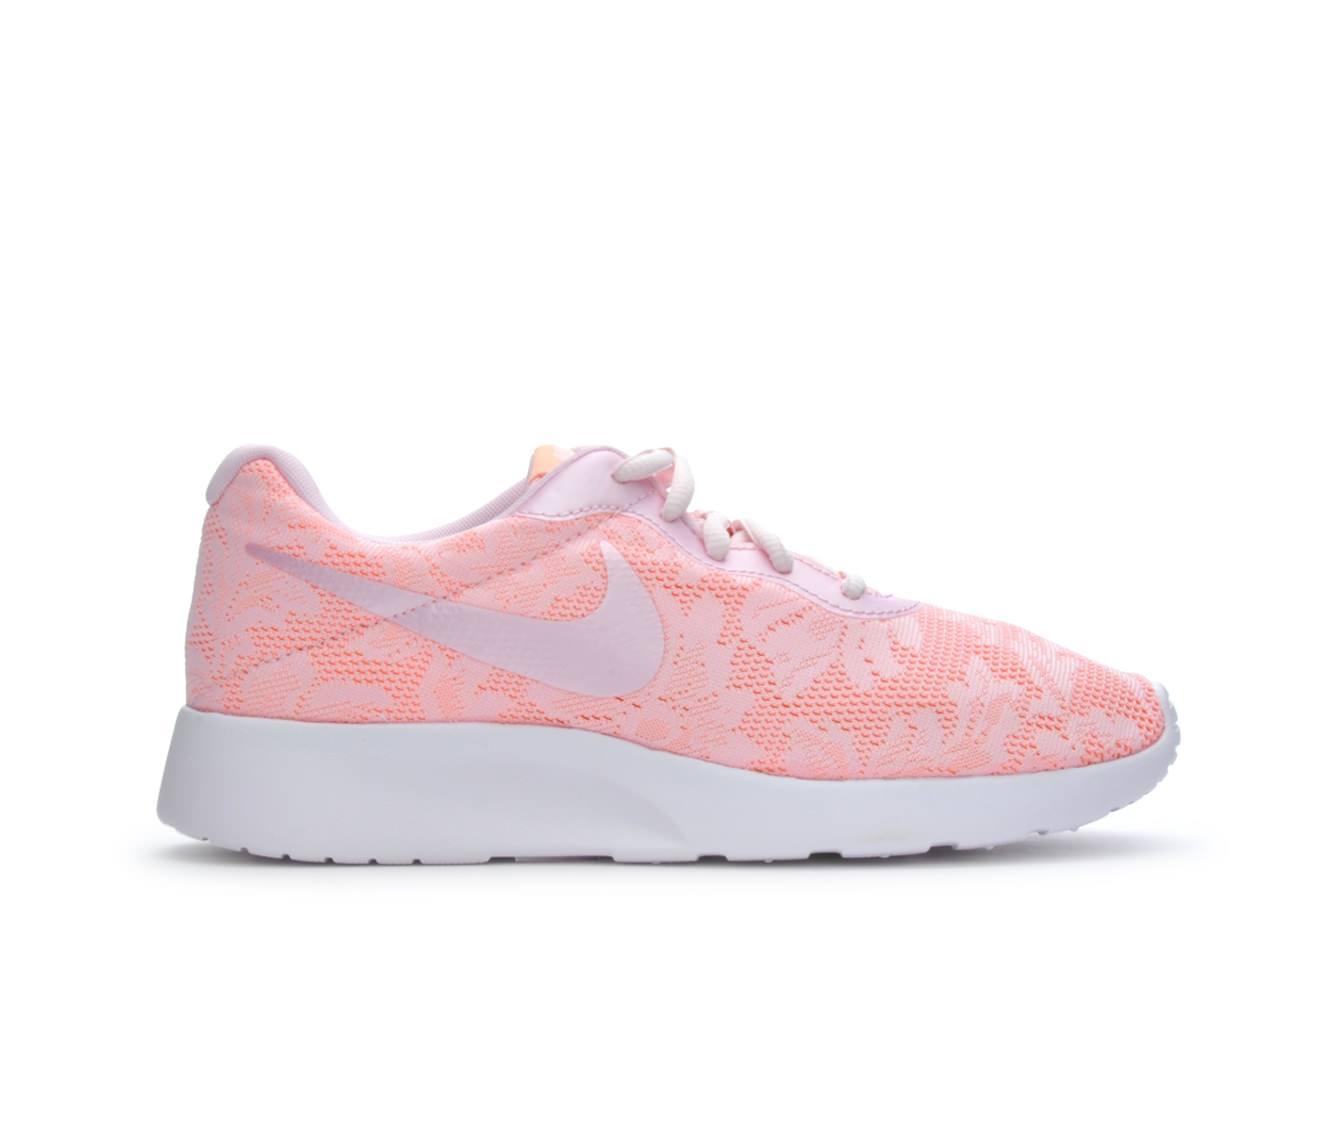 Women's Nike Tanjun Eng Sneakers (Pink - Size 12) 1642760